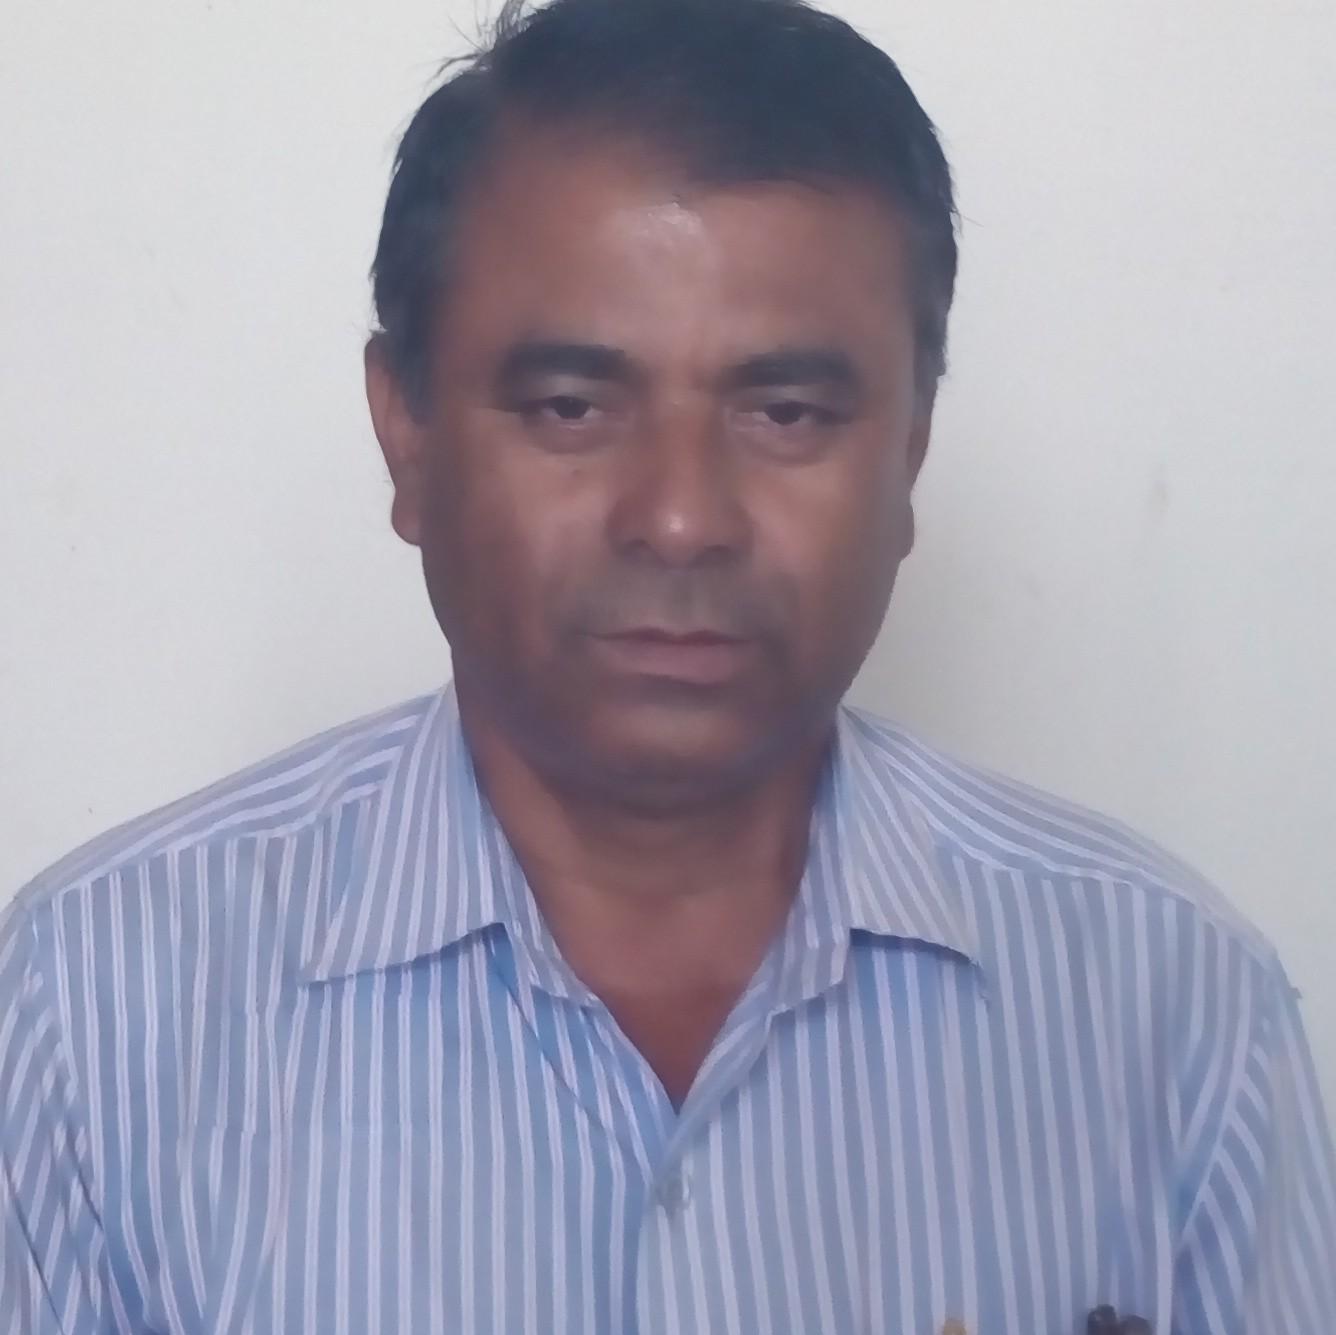 Mr Bhupal  Singh